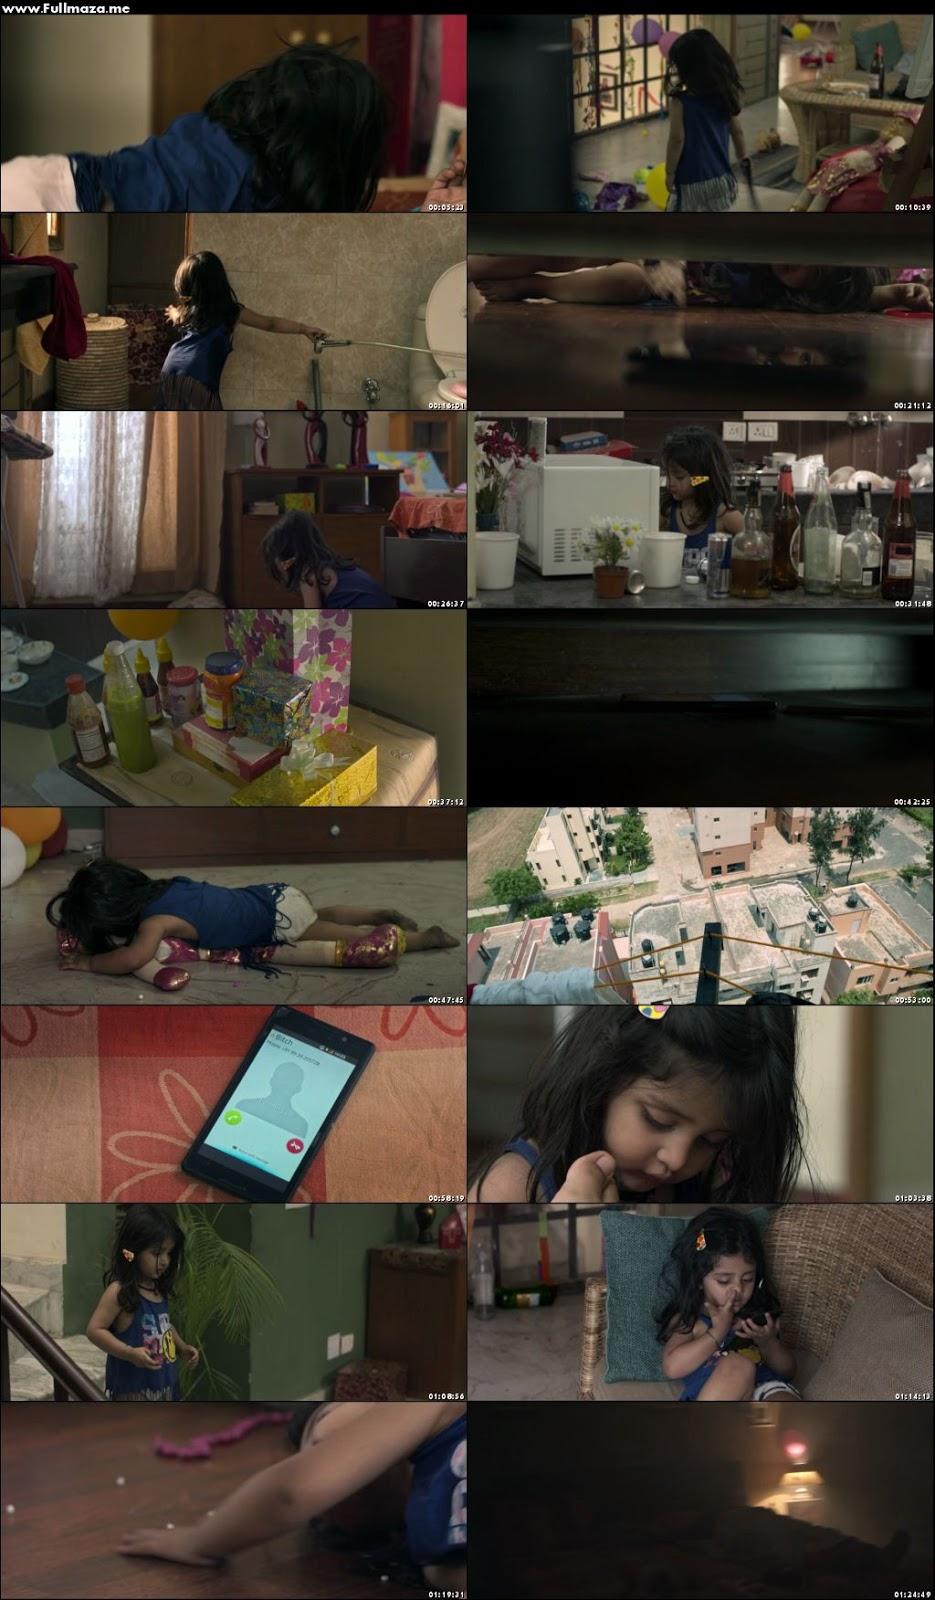 New Hindi Movei 2018 2019 Bolliwood: Pihu (2018) Movie 720p HDRip X264 [700MB]